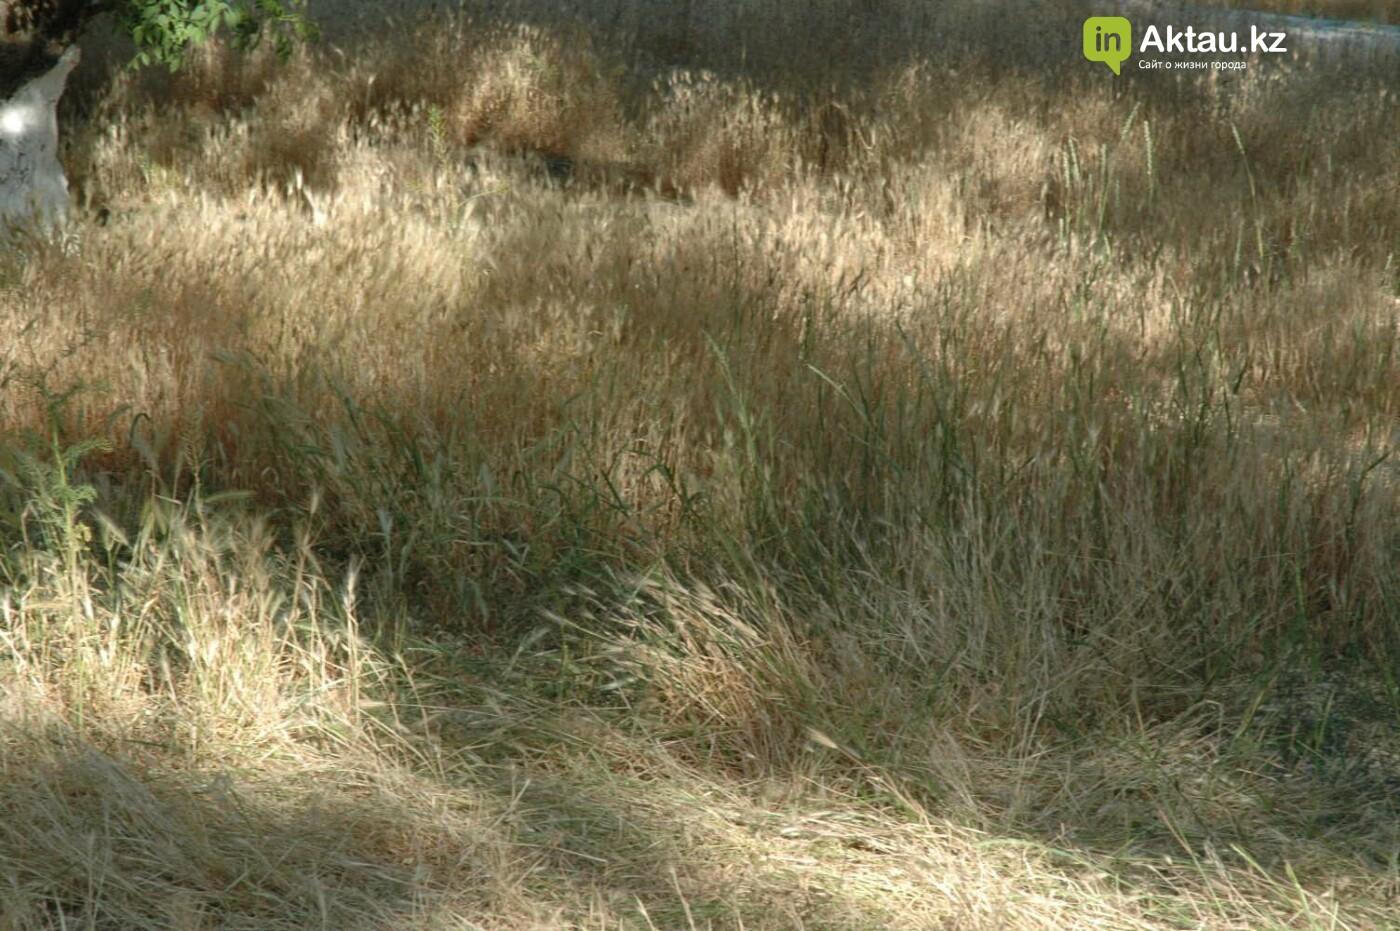 Погибшие от засухи и обезвоживания в Актау исчисляются десятками (ФОТО), фото-40